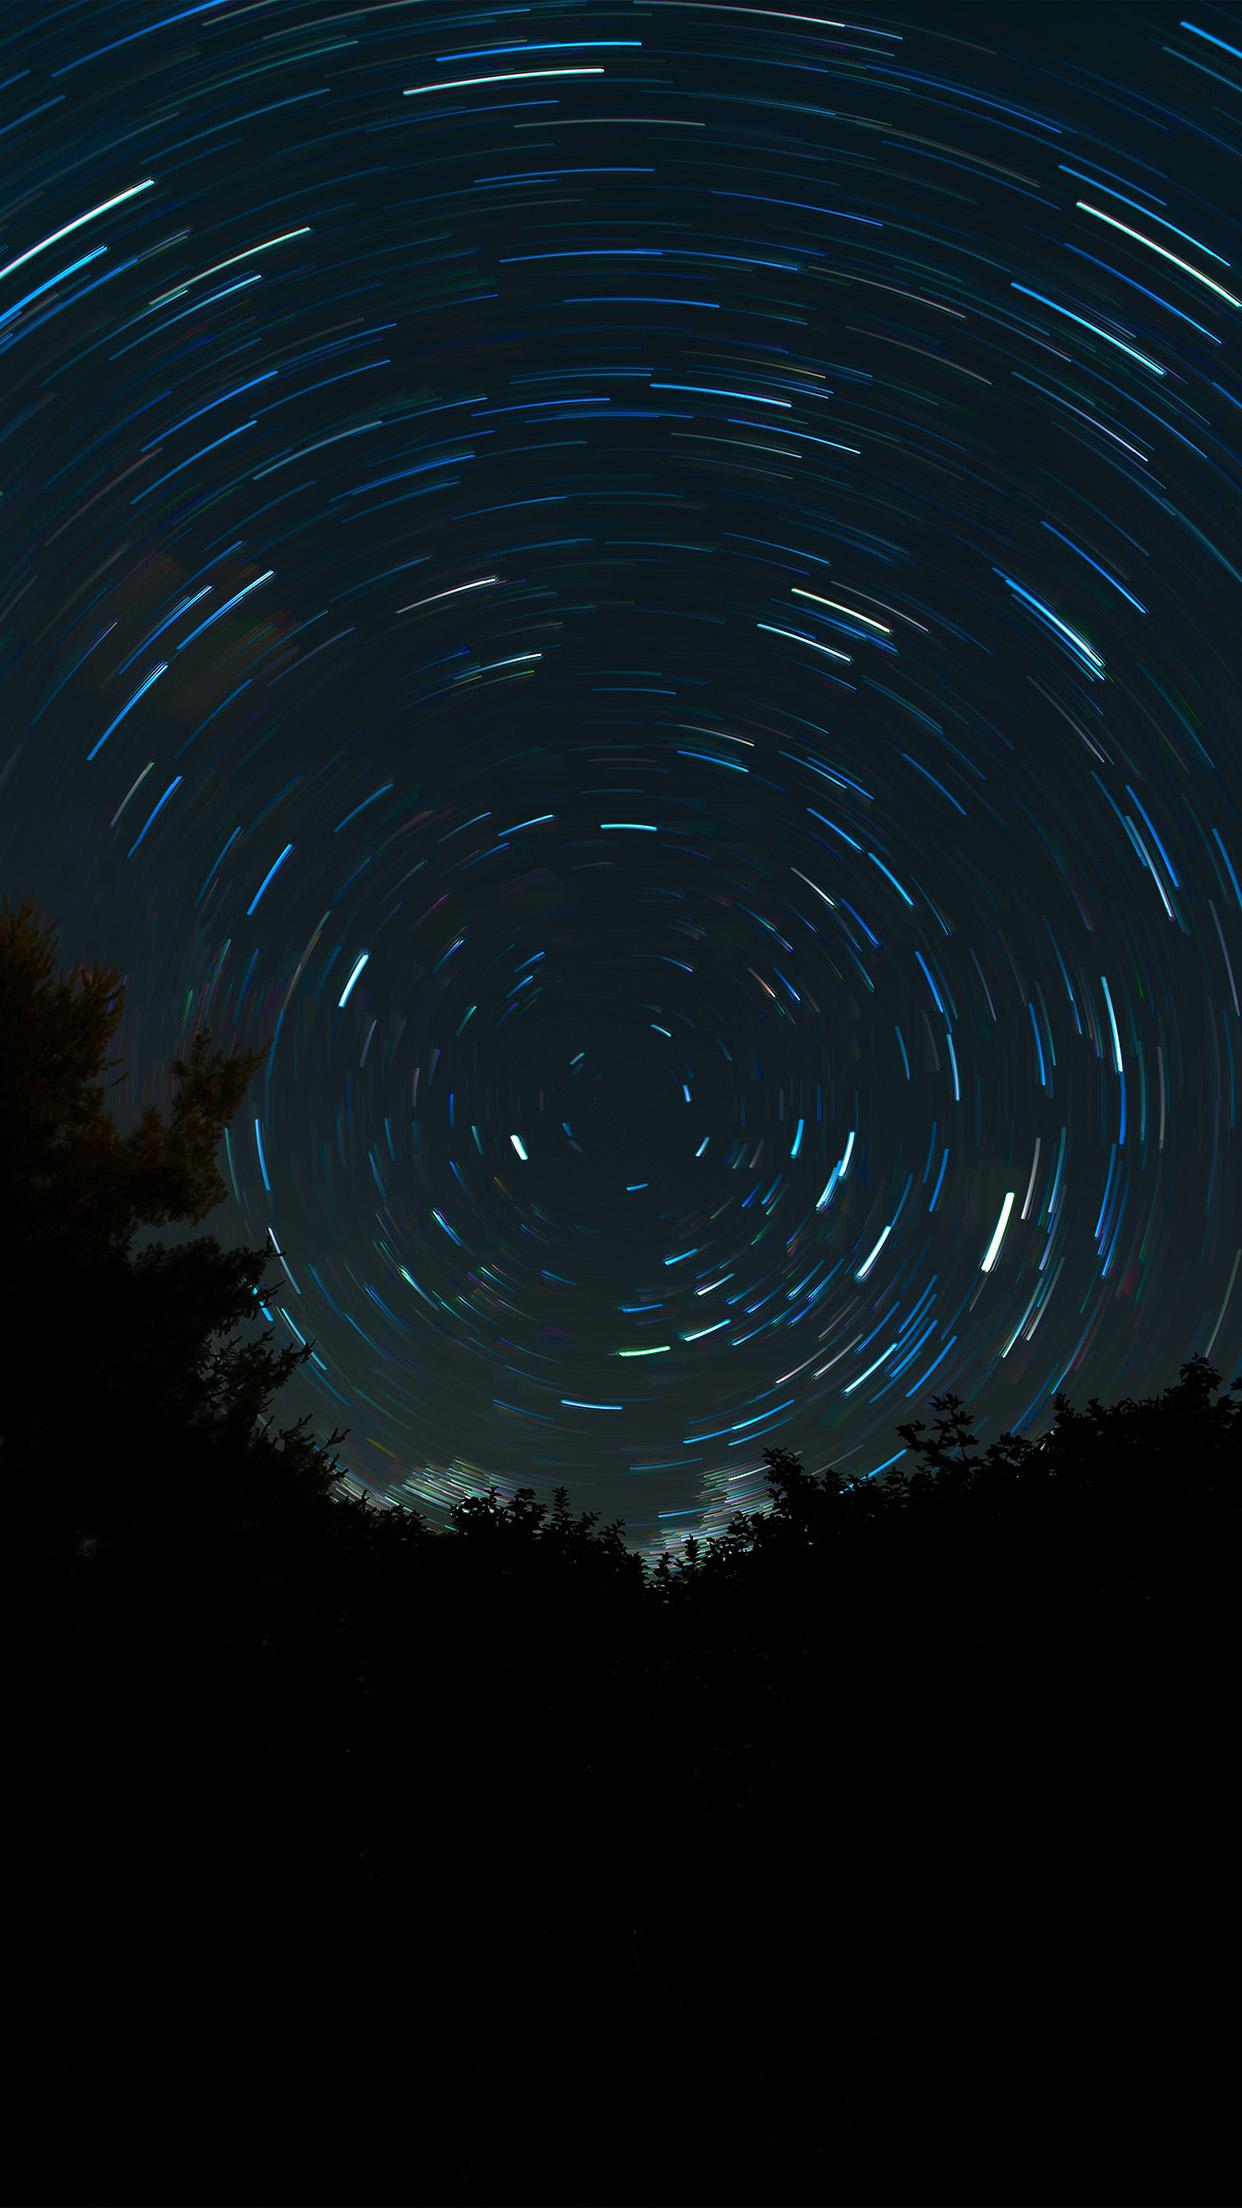 Fall Aesthetic Wallpaper No16 Space Night Sky Circle Dark Wallpaper